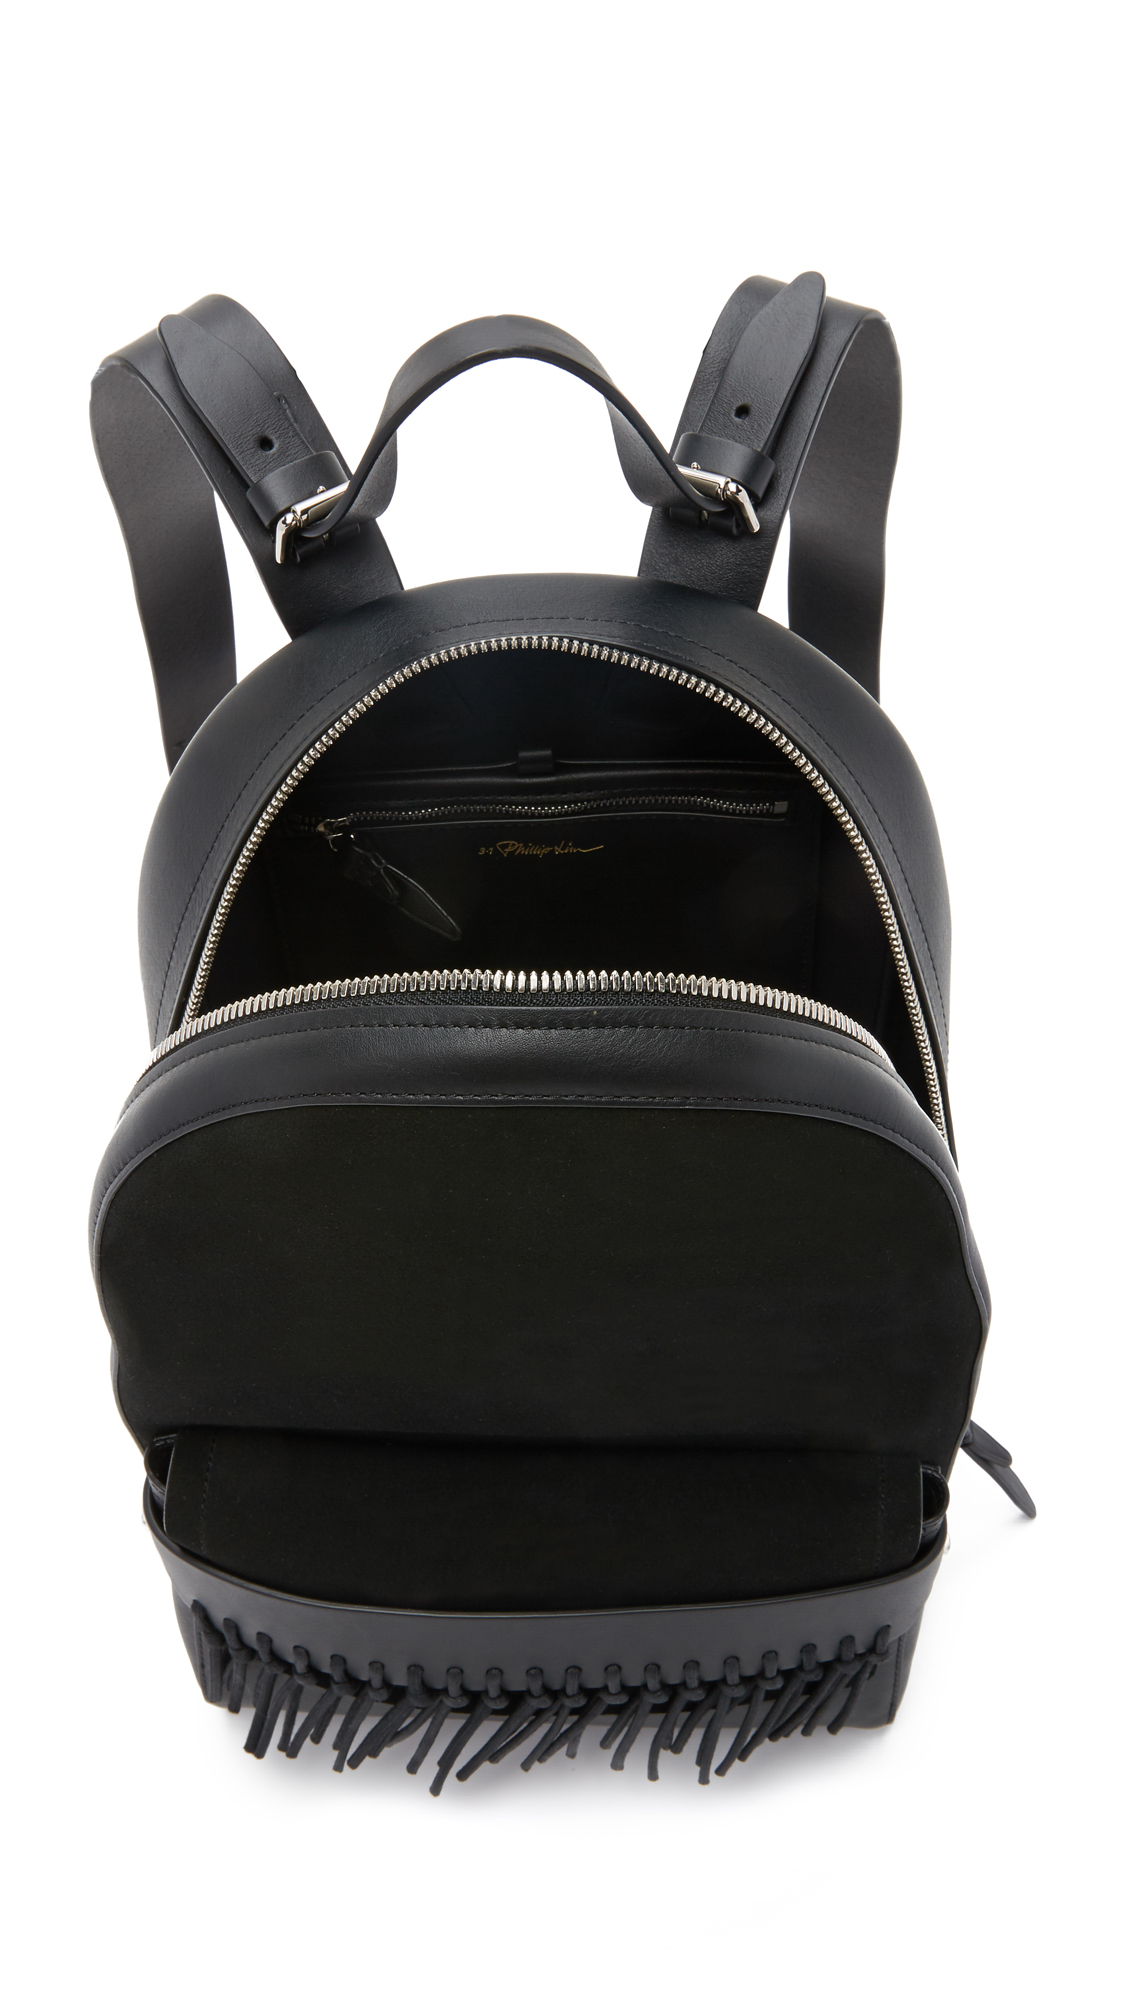 3.1 Phillip Lim Bianca Mini Backpack With Fringe in Black